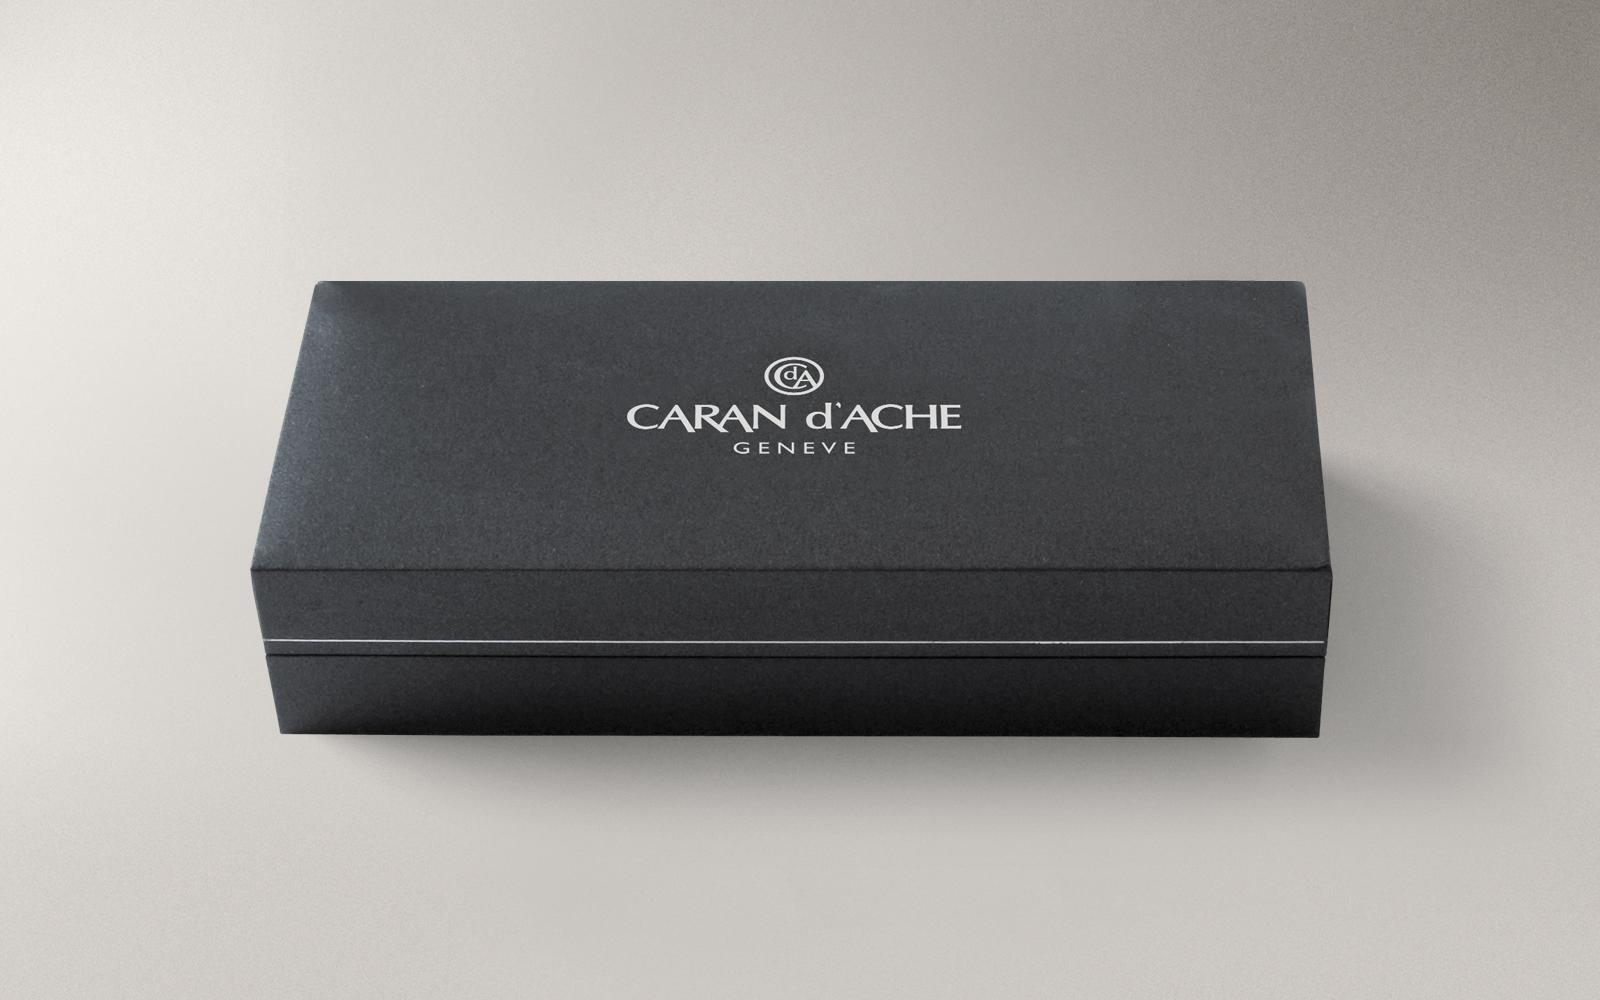 Carandache Madison - Cisele SP, ручка-роллер, F